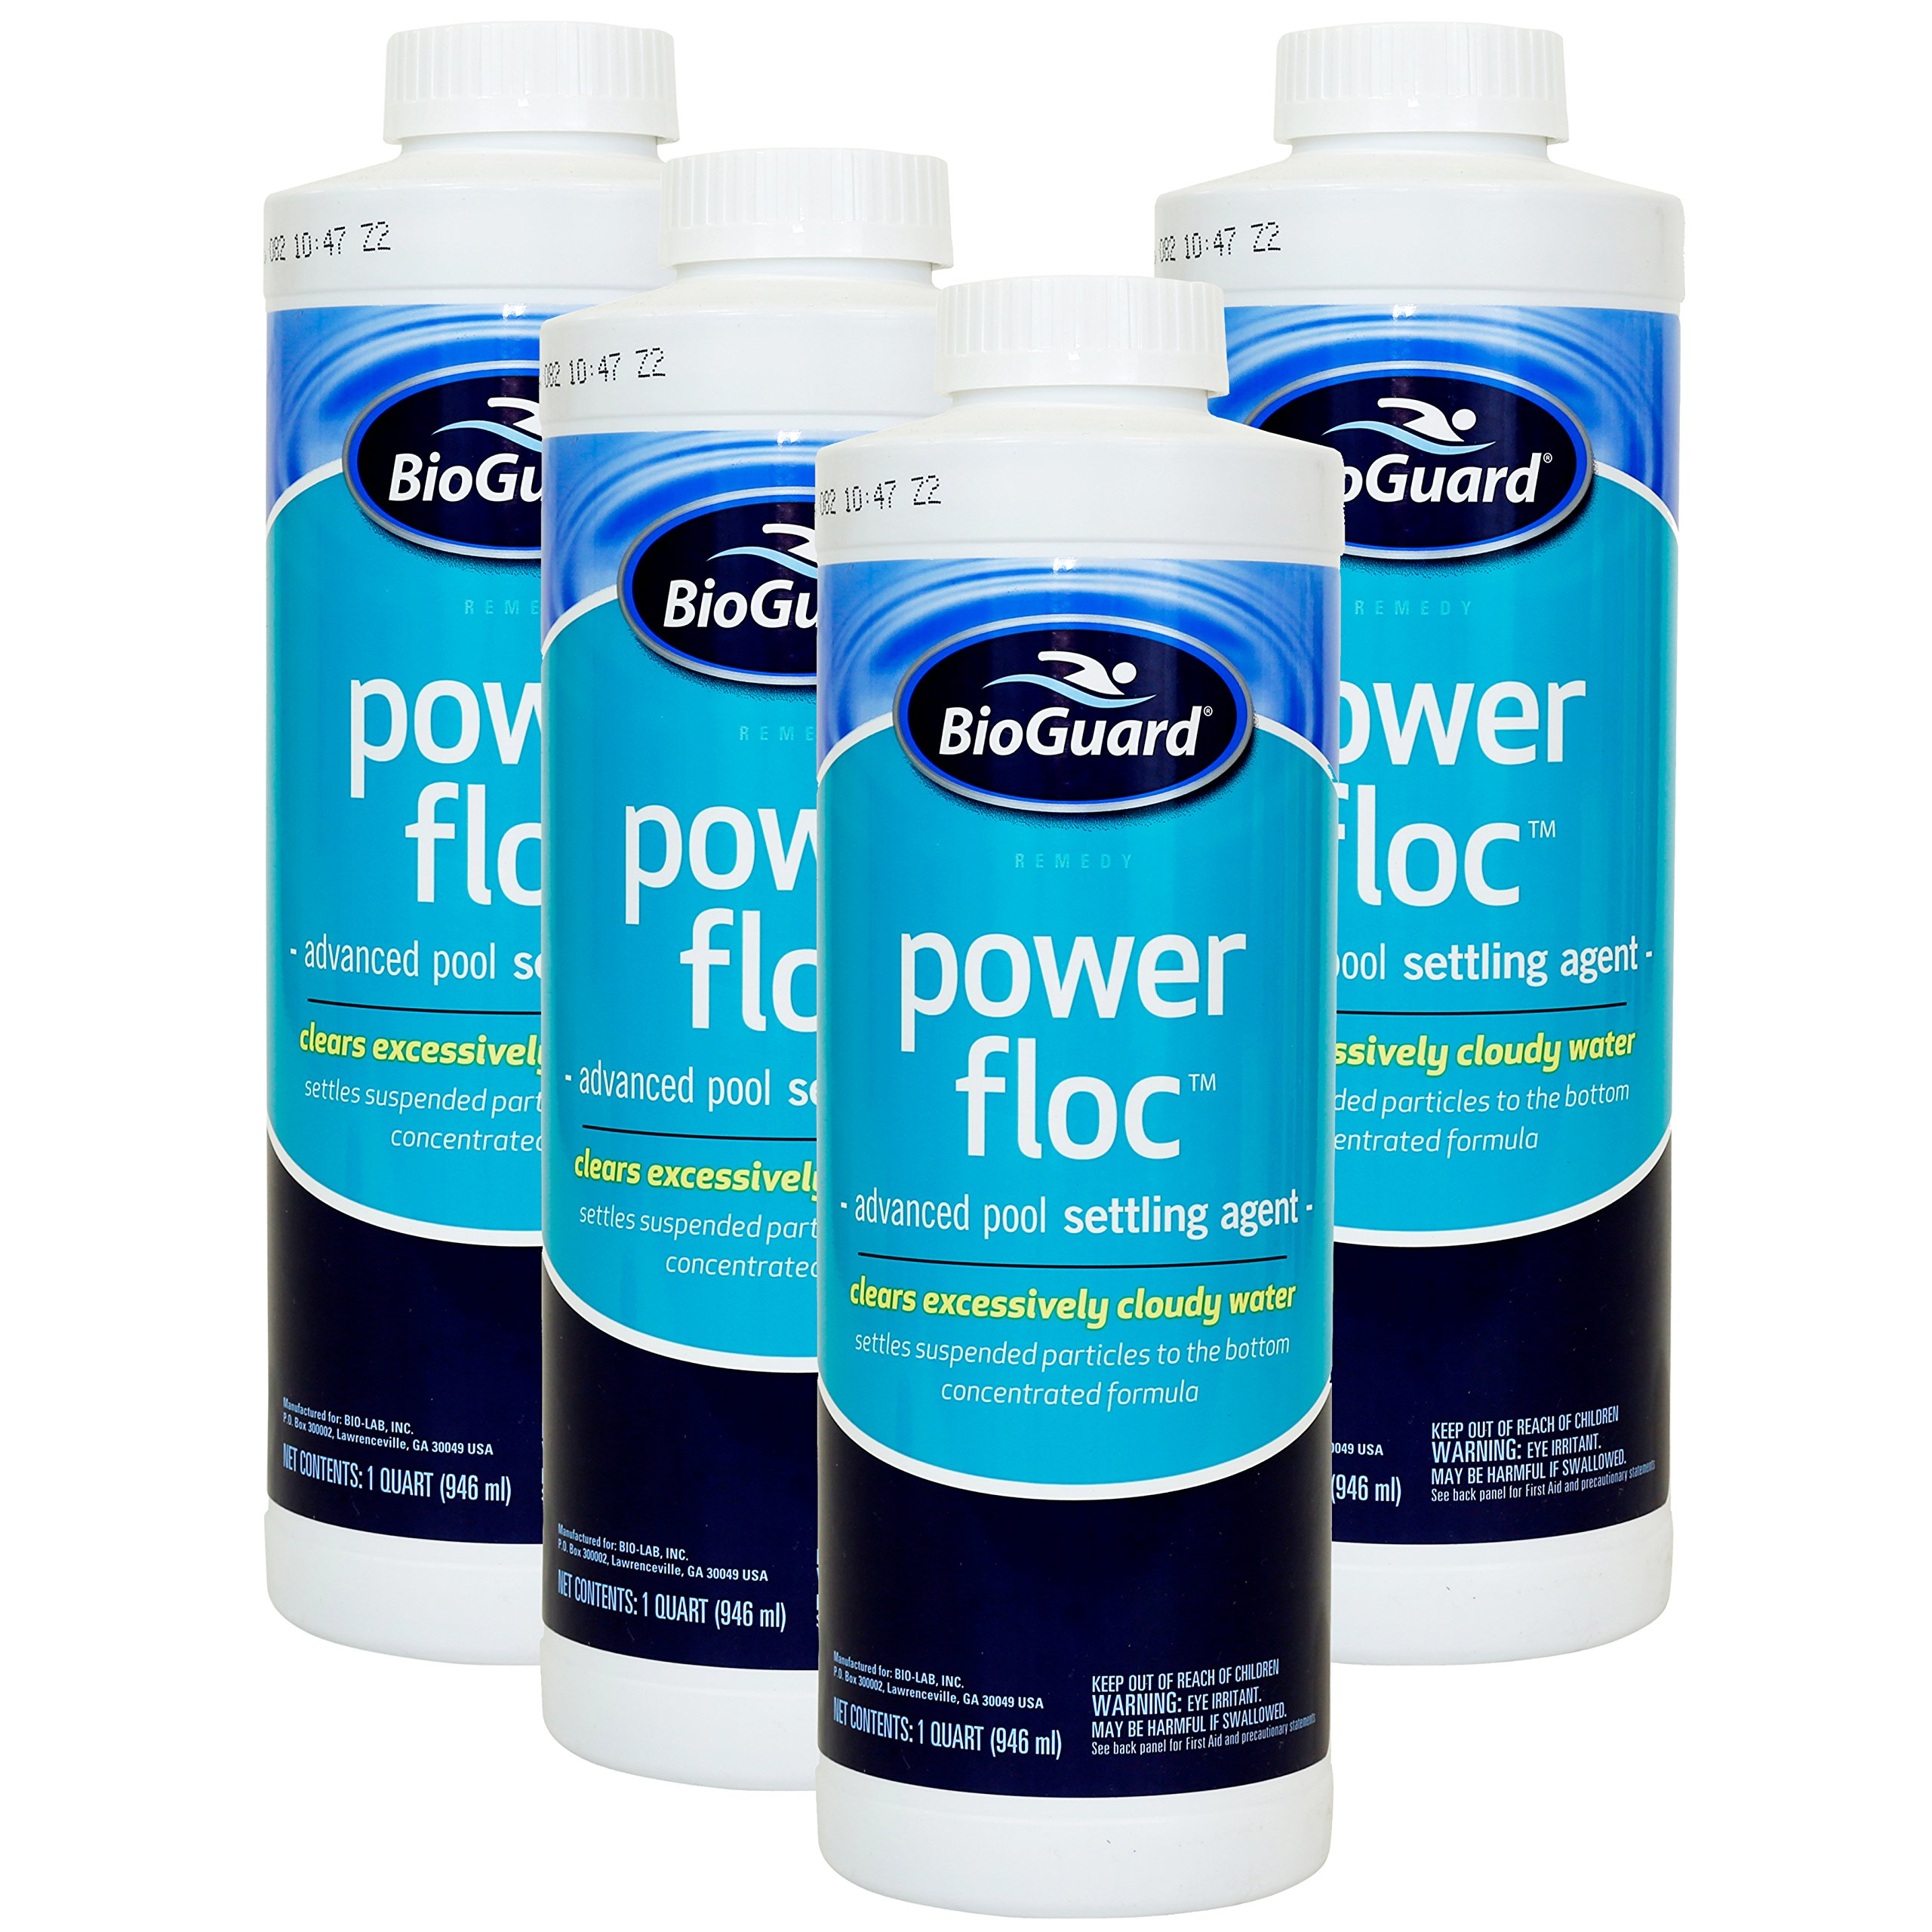 BioGuard PowerFloc (32 oz) (4 Pack)